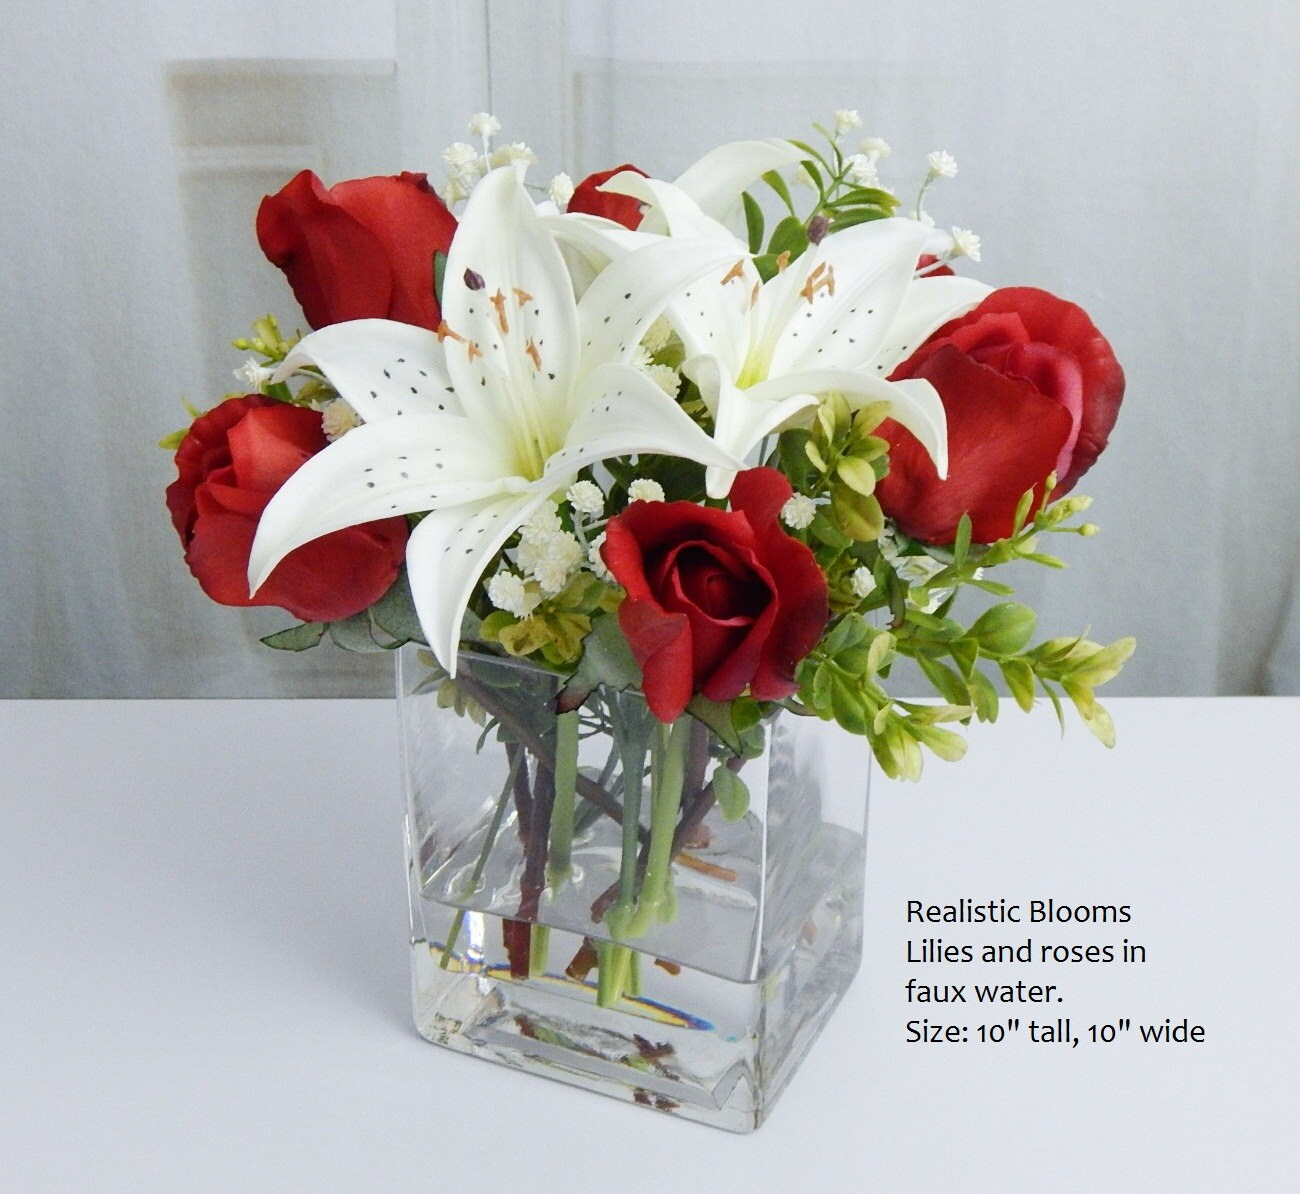 Red white silk roseroses lilylilies glass vase faux water red white silk roseroses lilylilies glass vase faux water acrylic real touch flowers floral arrangement centerpiece decor gift izmirmasajfo Image collections